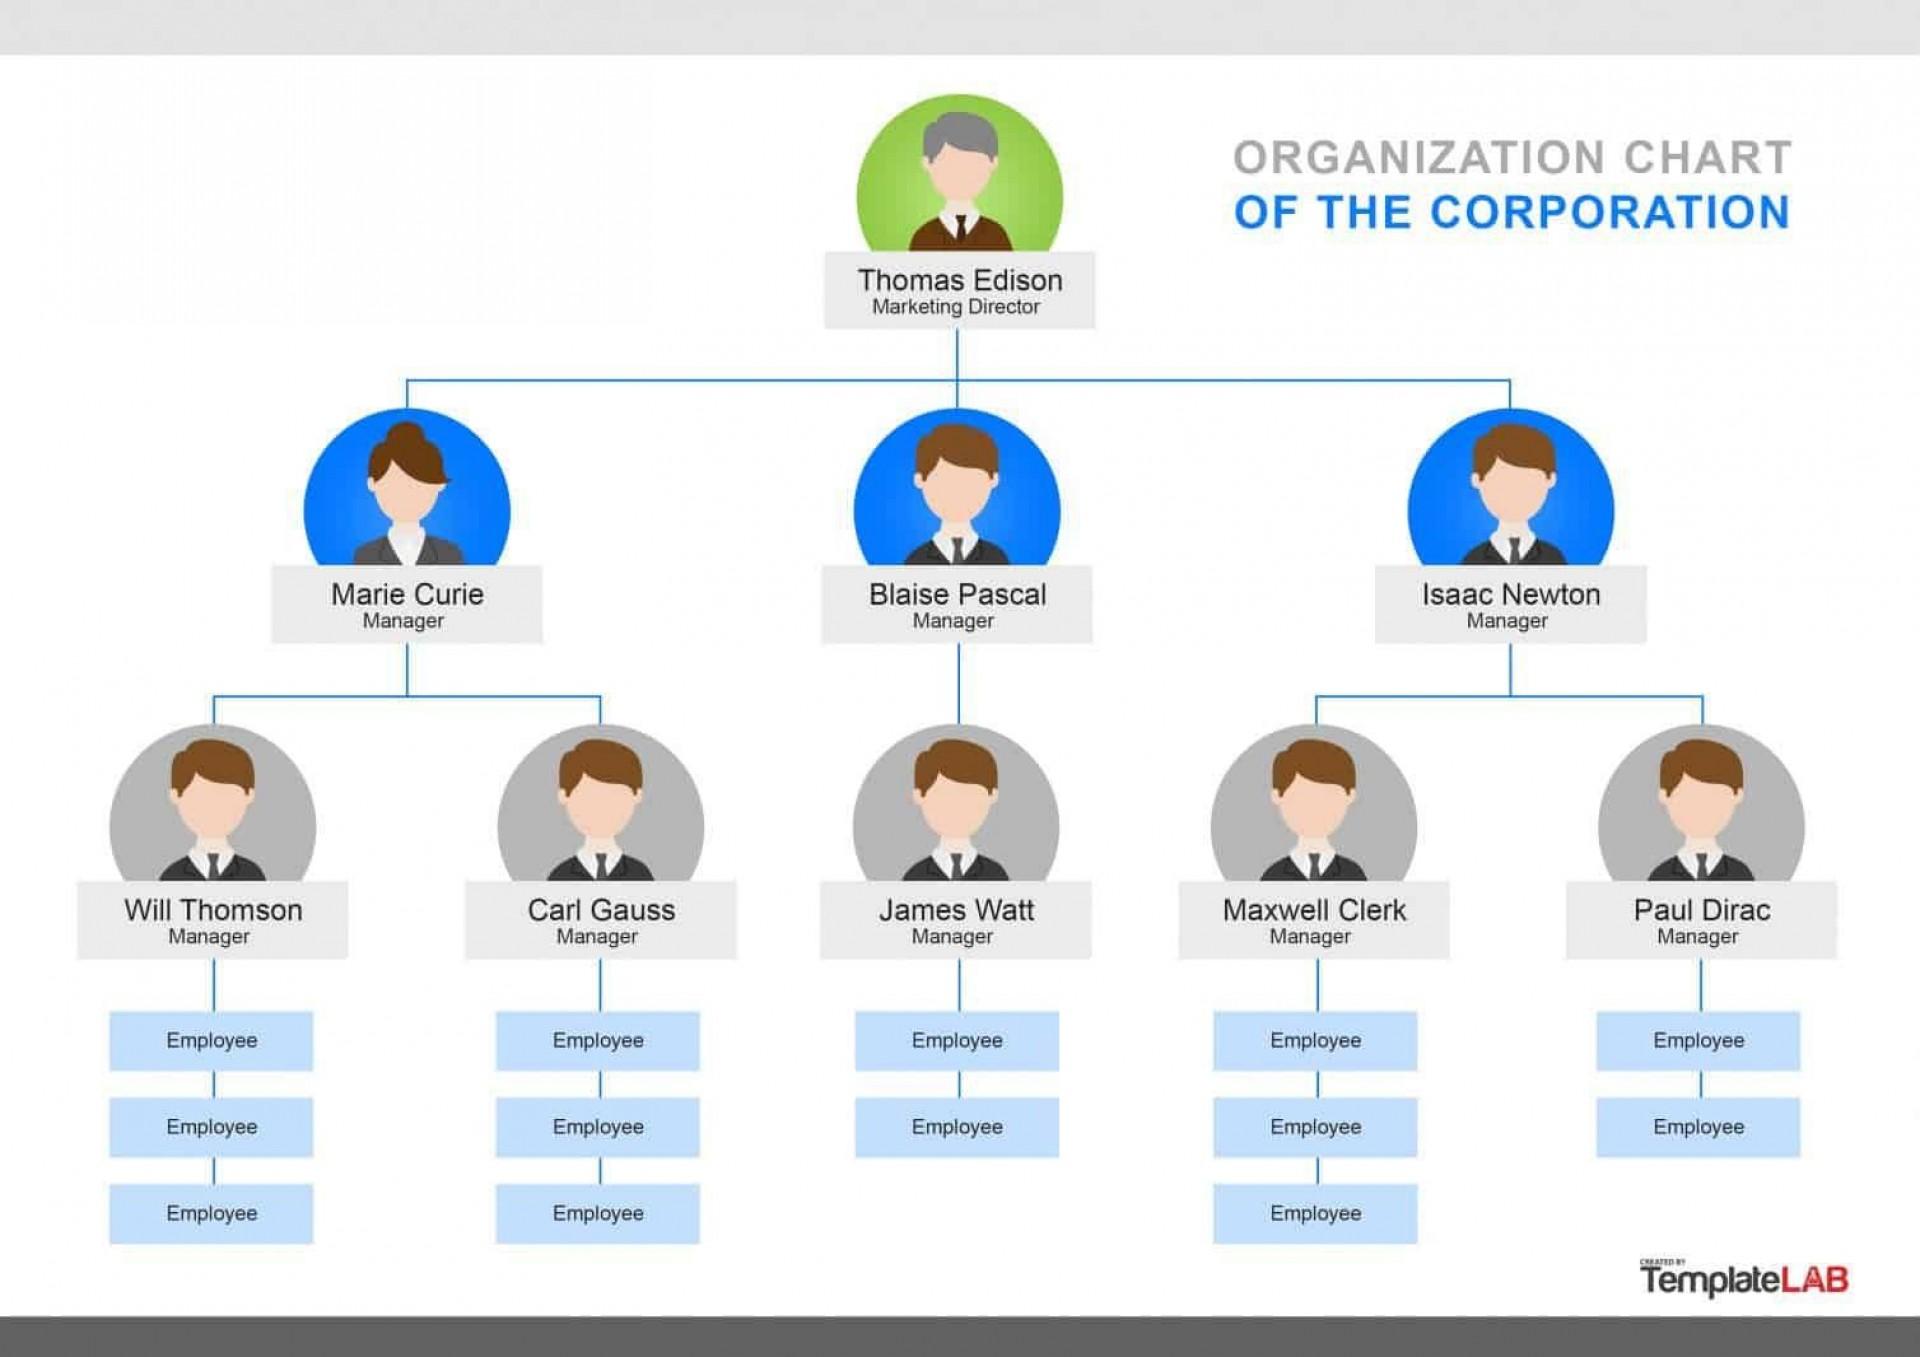 000 Breathtaking Free Word Organisational Chart Template Example  Microsoft Organizational1920